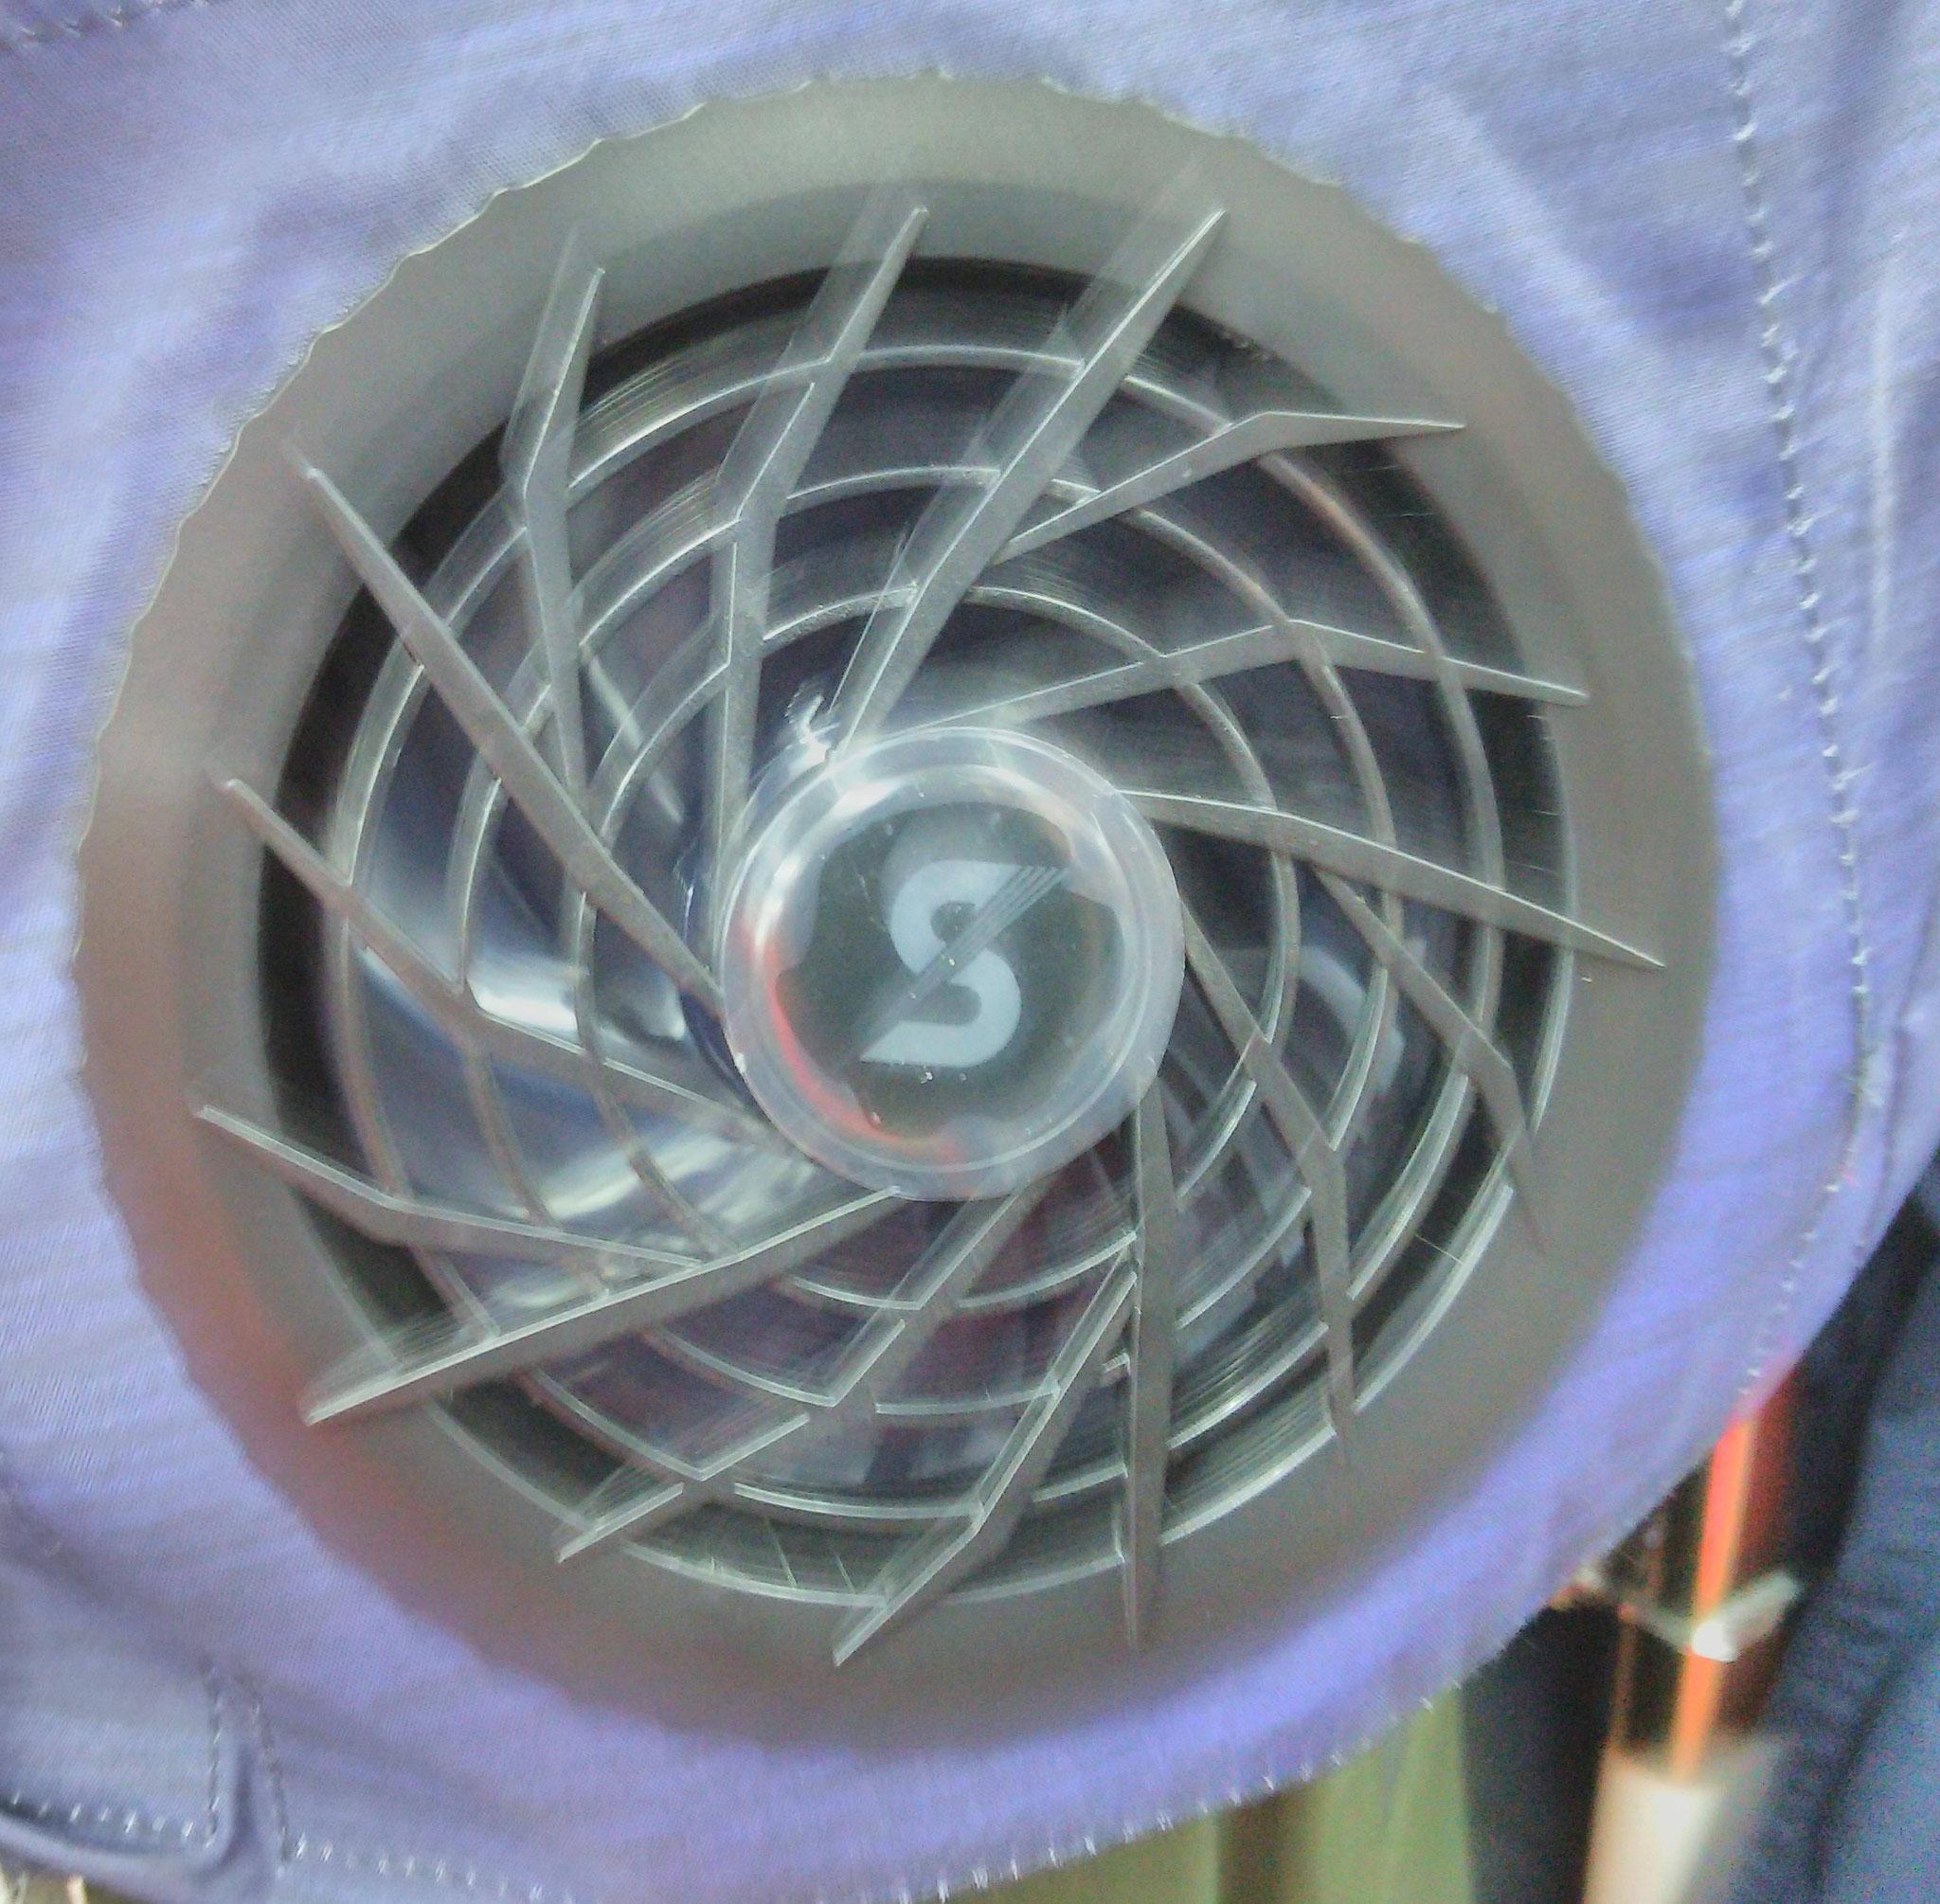 S-AIR<エスエアー>空調機器 出力 7.5V 連続8時間 ¥9900(税込)